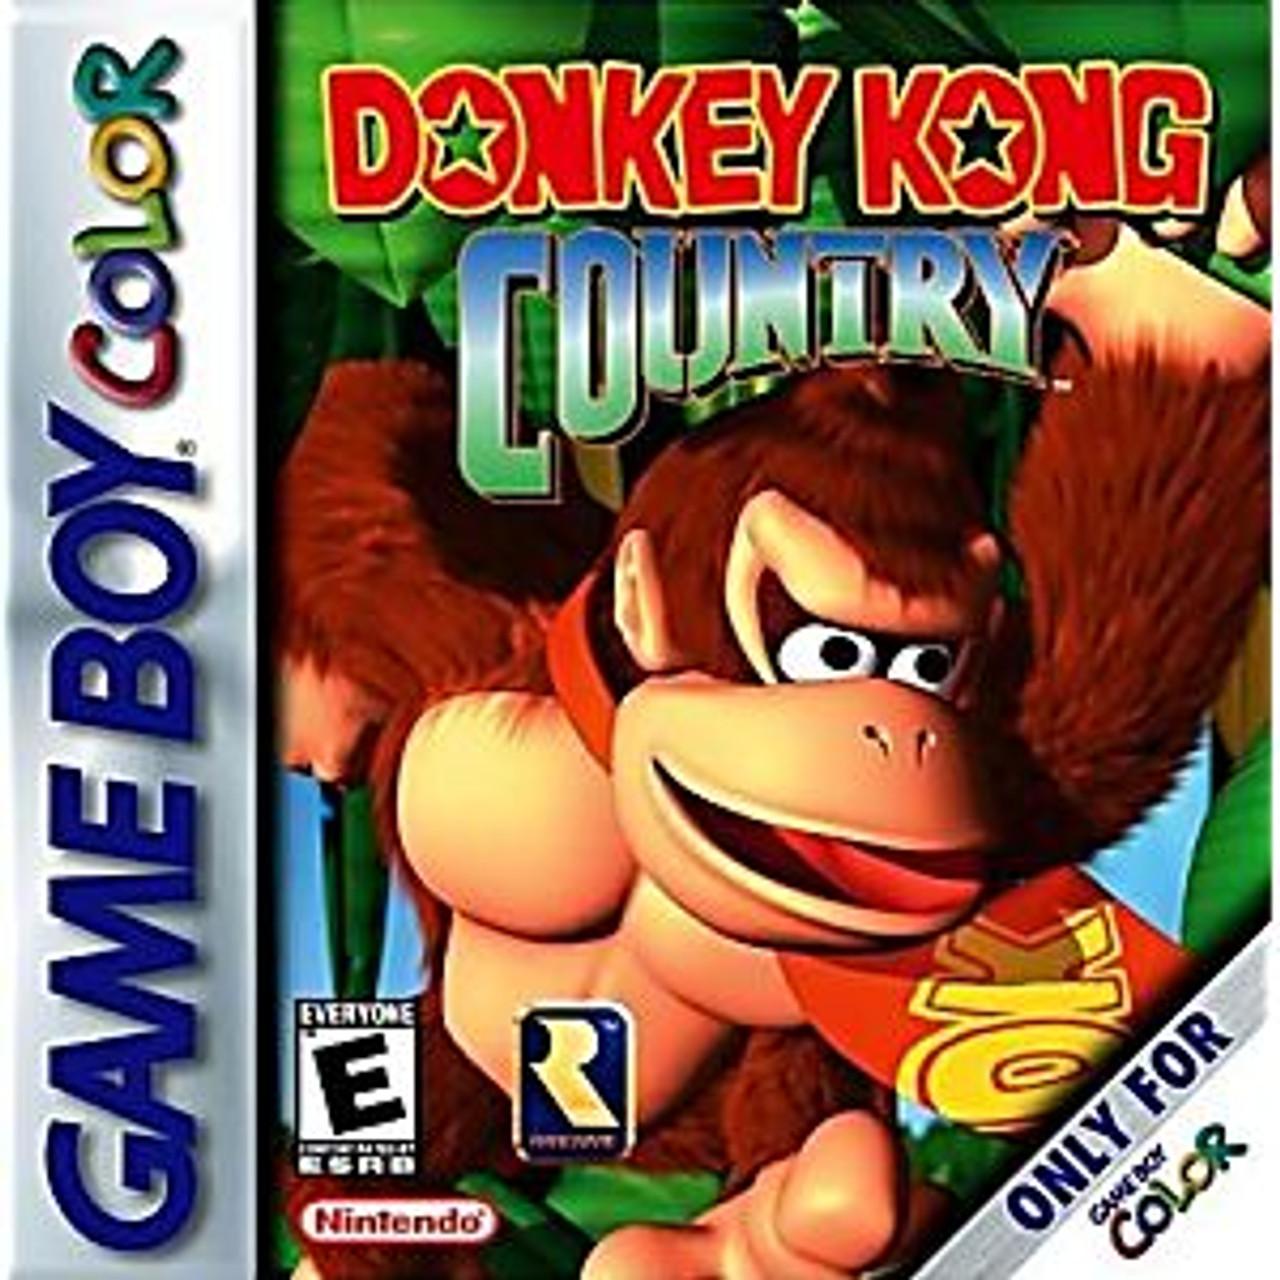 DONKEY KONG COUNTRY [E]